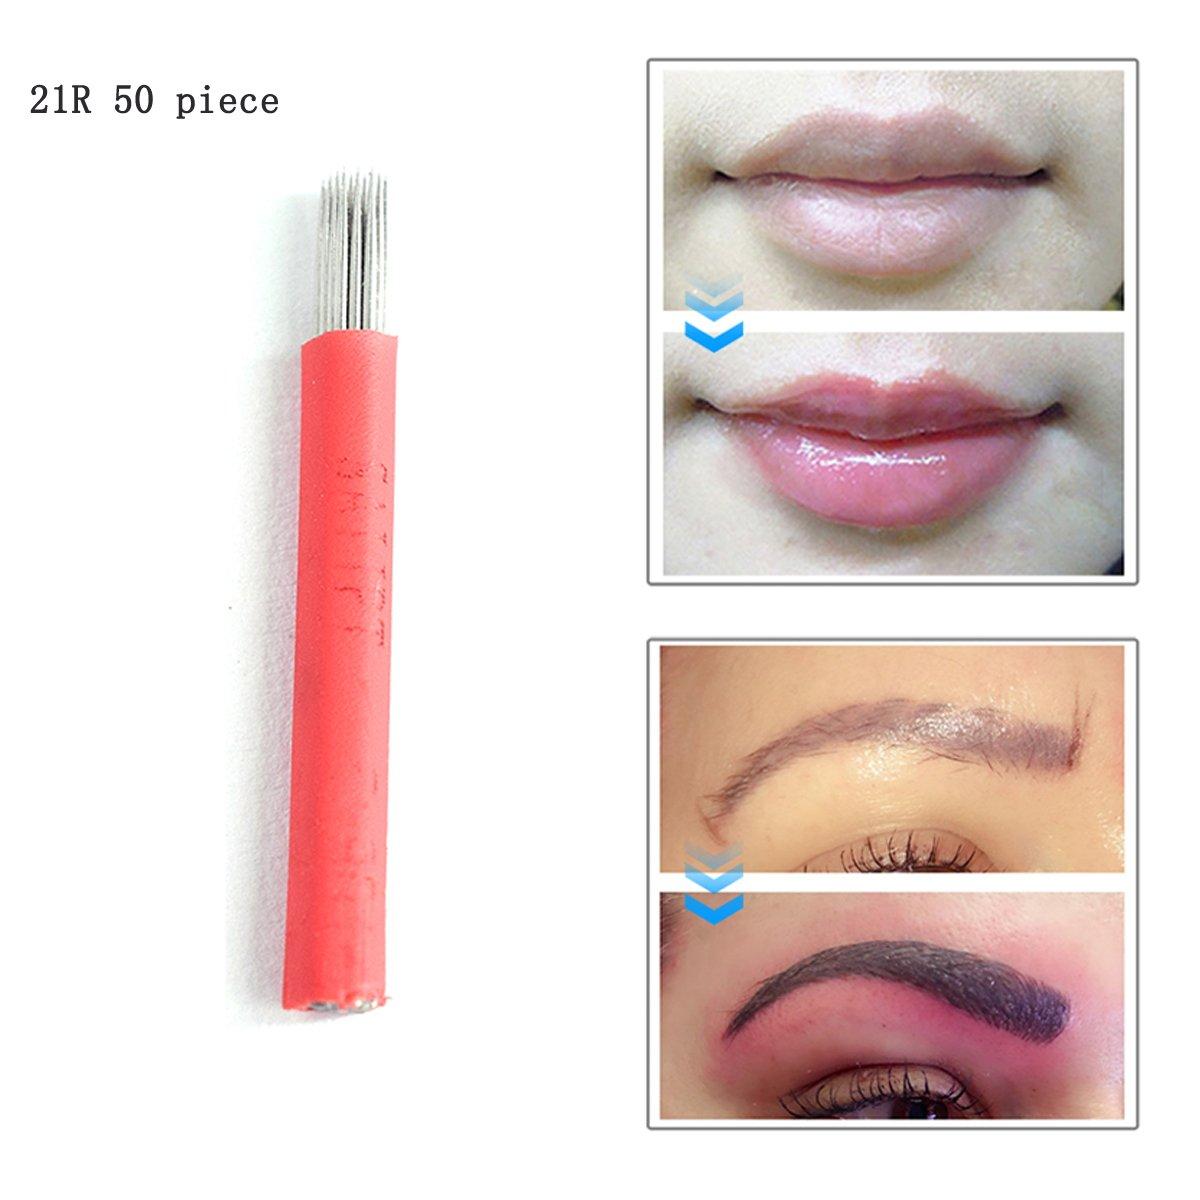 Microblading Needles 21R 50pcs Professional Microblading Needles Manual Lip Permanent Eyebrow Tattoo Makeup